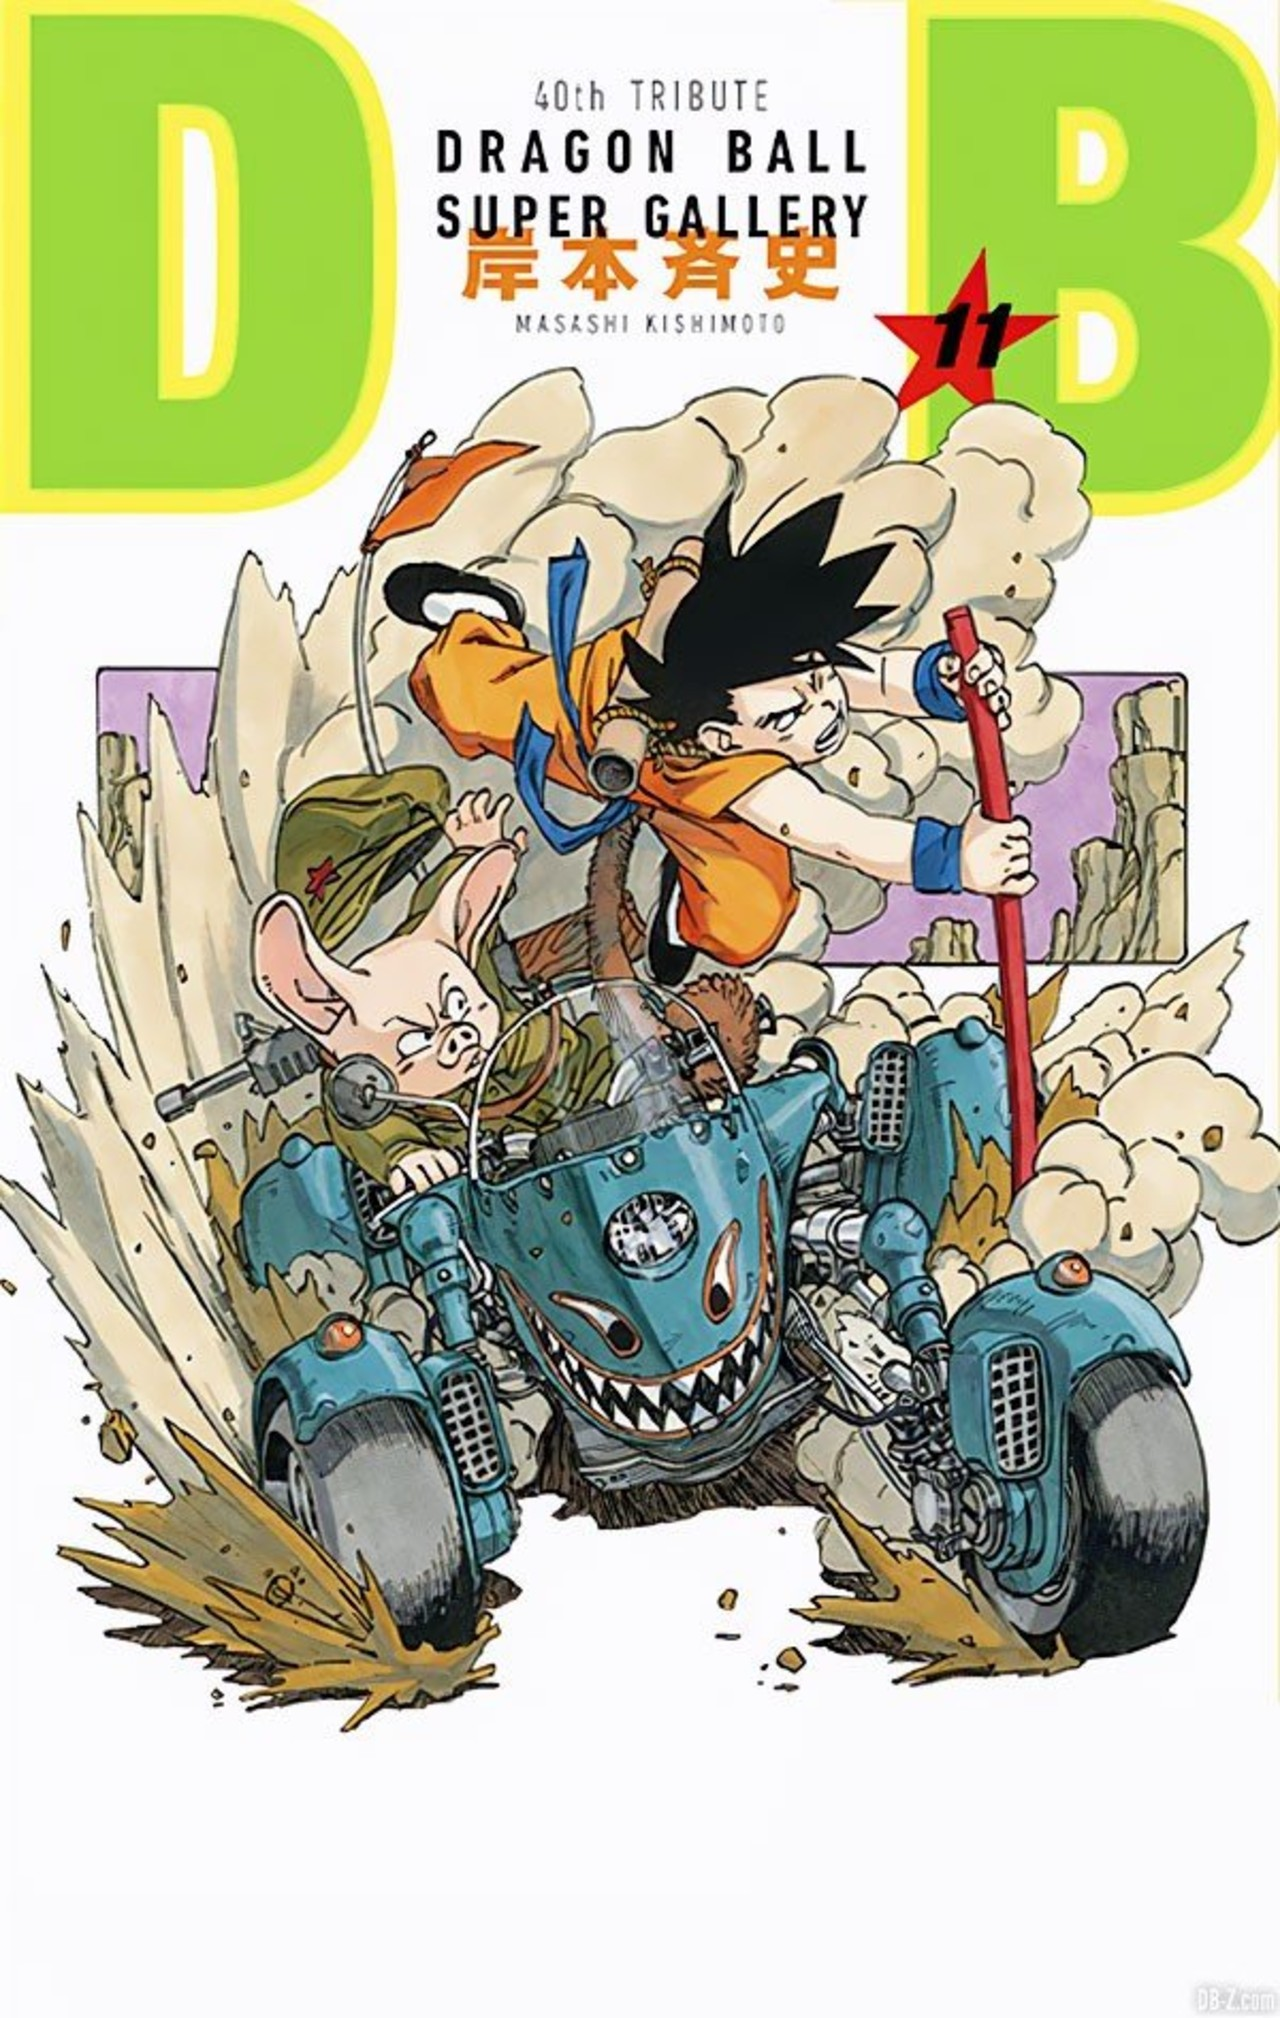 Imágenes de Dragon Ball Naruto